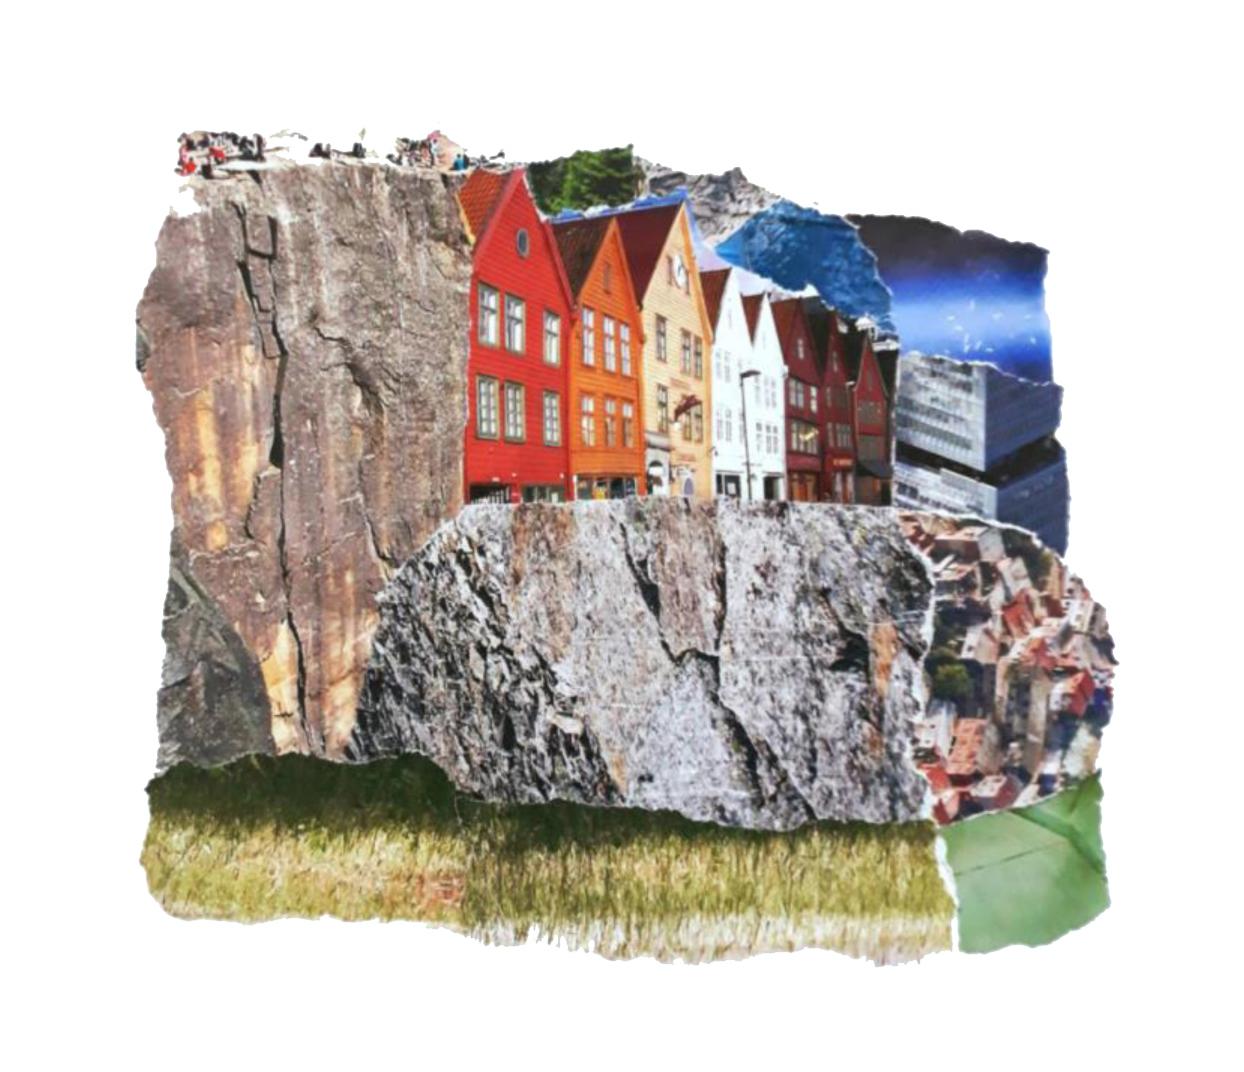 On the rocks, Papiercollage, 20 x 26 cm (inkl. Objektrahmen), 2019